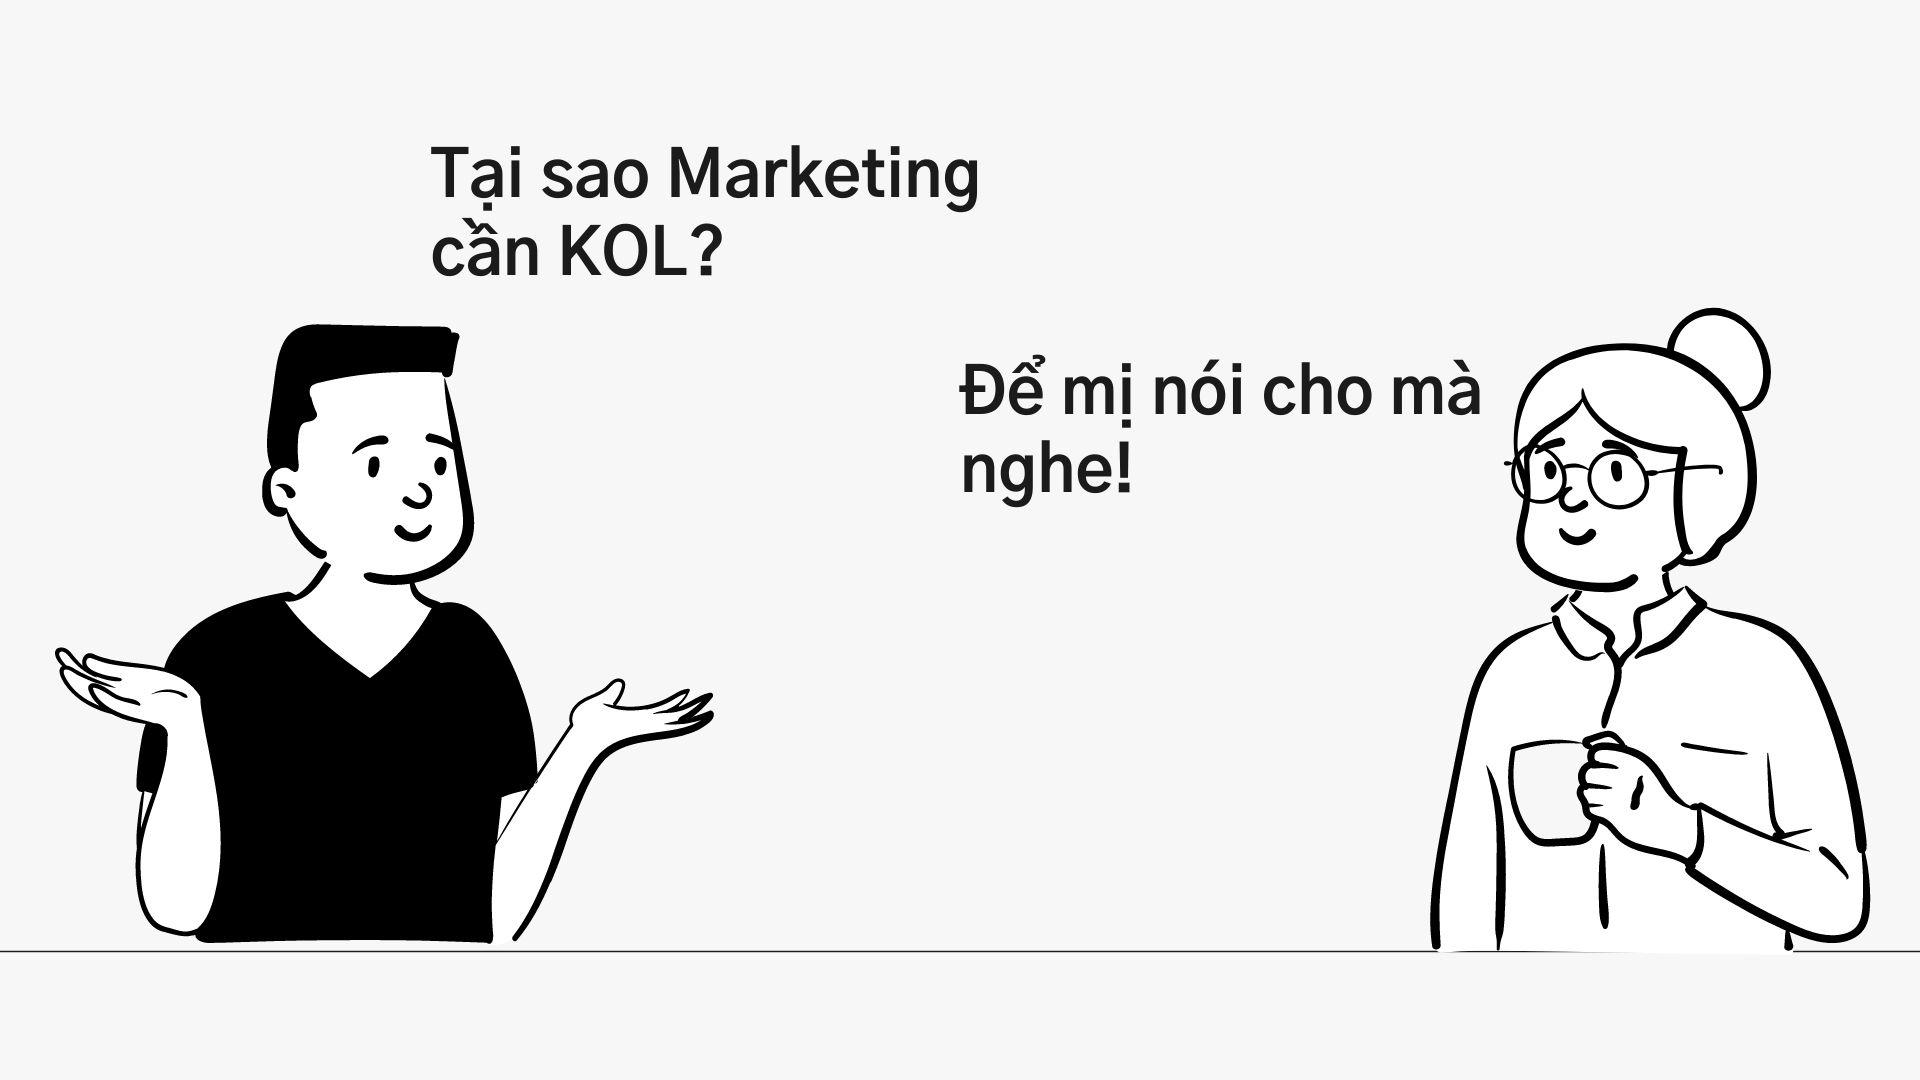 Tại sao marketing cần KOL